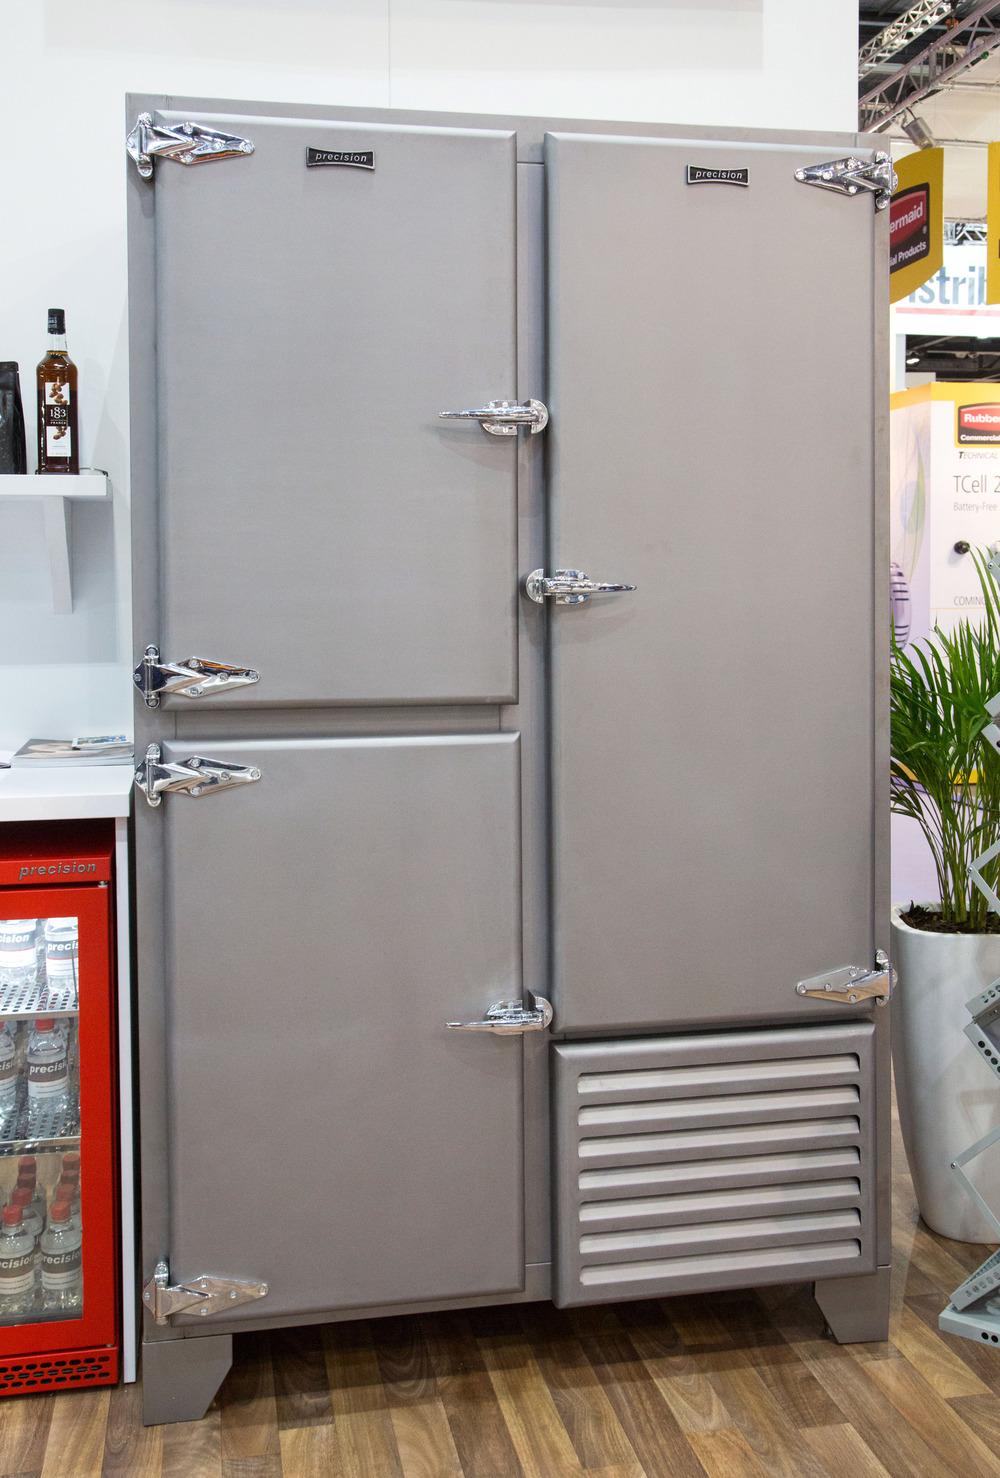 Retro Fridge With Solid Doors